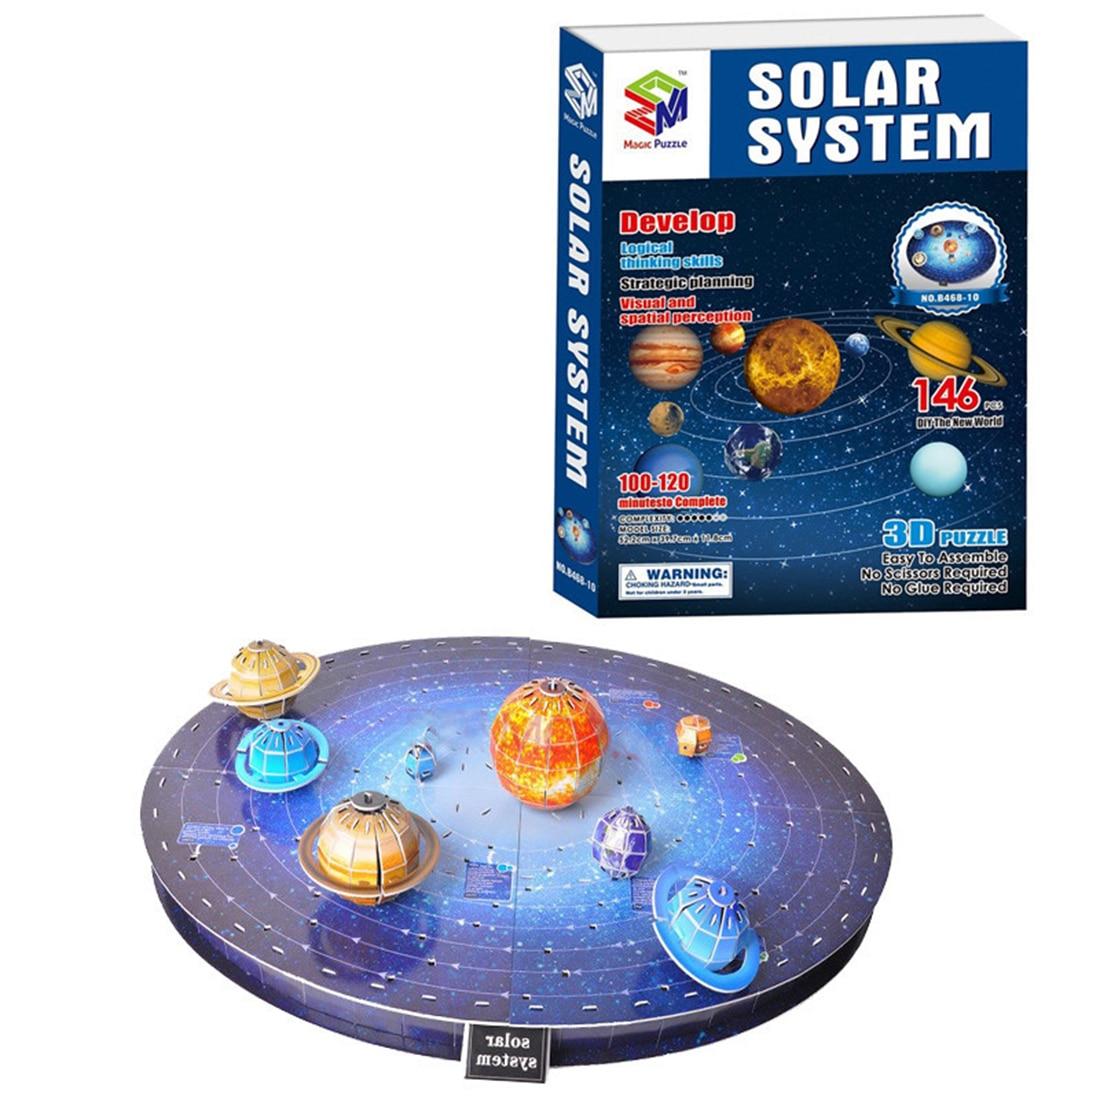 US $17 86 42% OFF 146Pcs Age 6+ Kids 3D Sun Solar System Puzzle Set Planet  Model Building Board Game 3D Paper DIY Jigsaw Toy Children Education-in